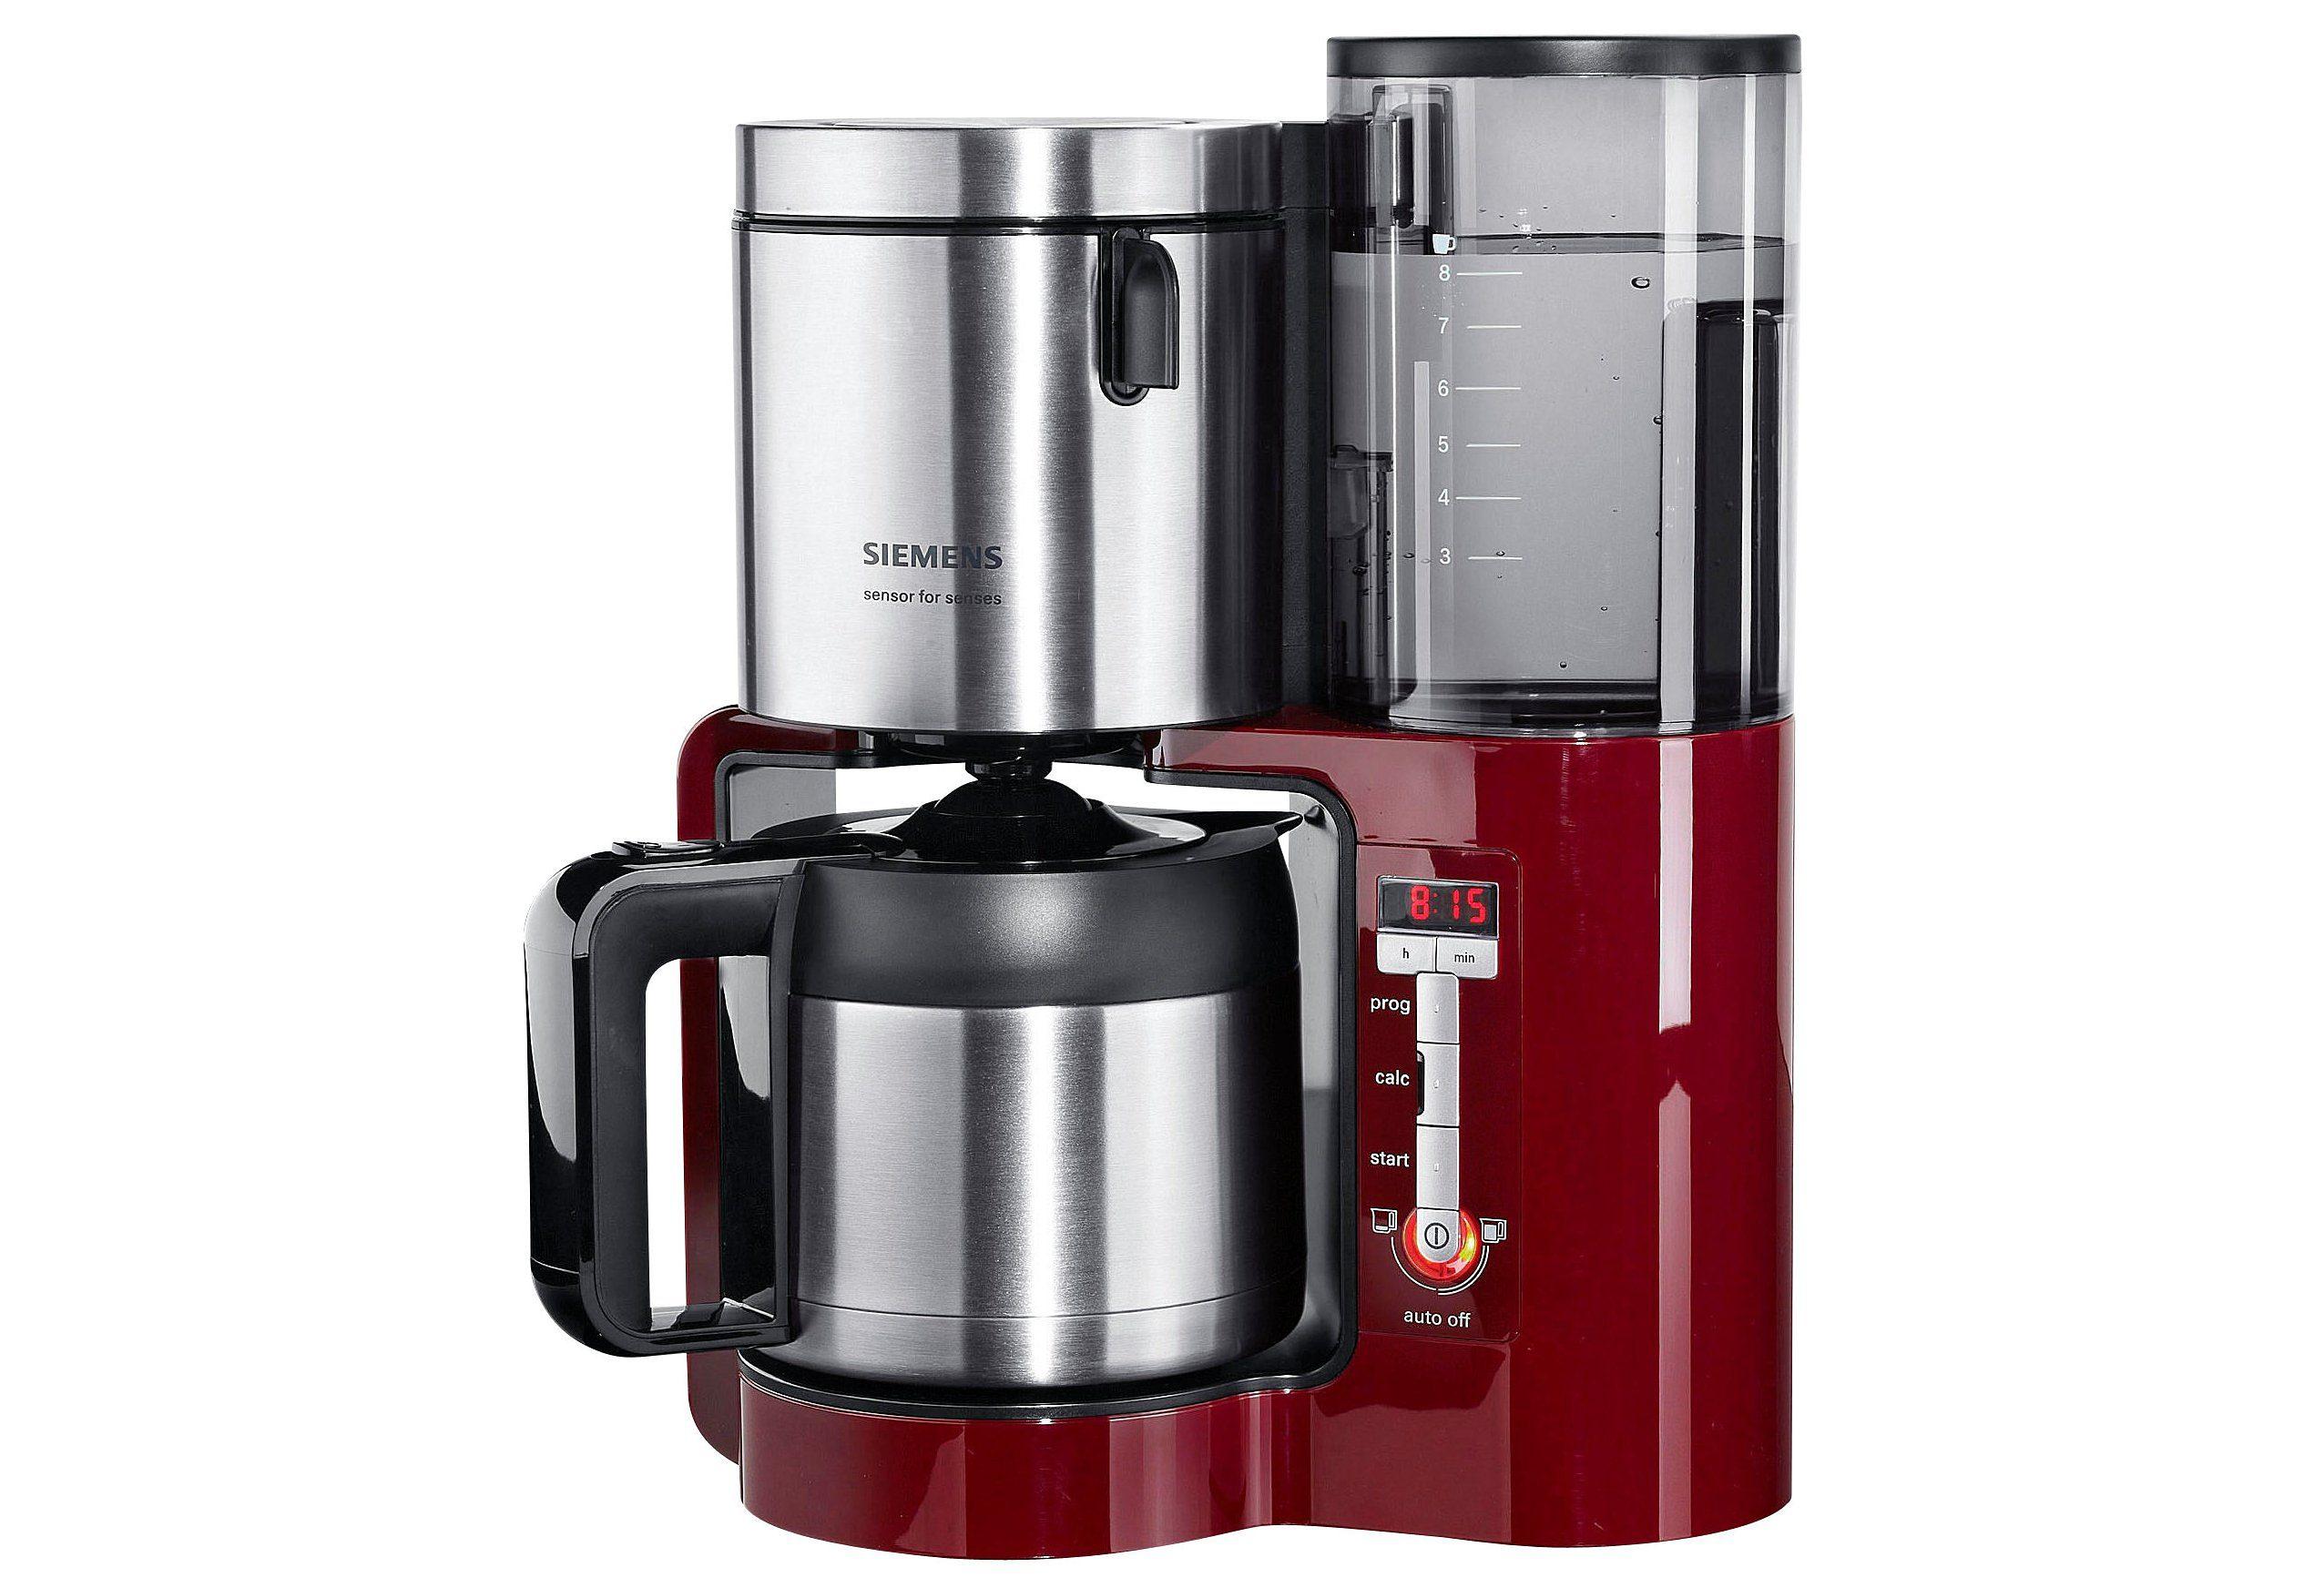 SIEMENS Filterkaffeemaschine TC86504 Sensor for Senses, 1,15l Kaffeekanne, Papierfilter 1x4, Wassertank mit Griff